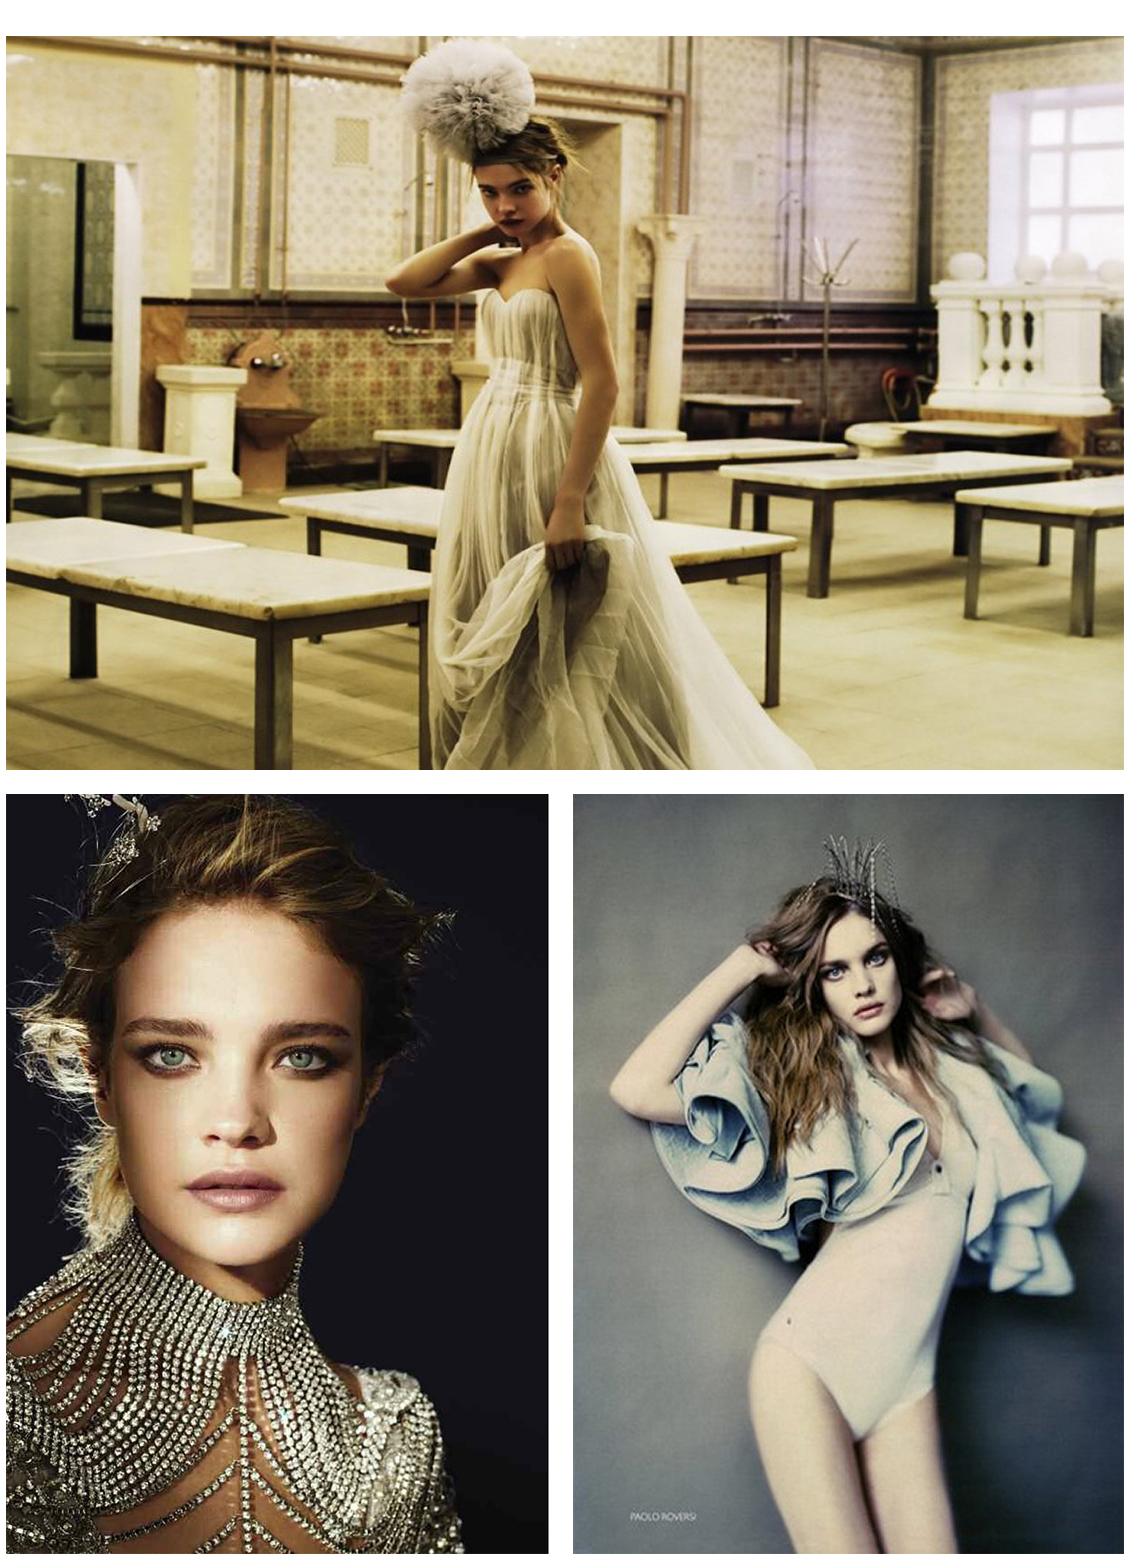 Natalia Vodianova Wedding Dress Vintageweddingplanner